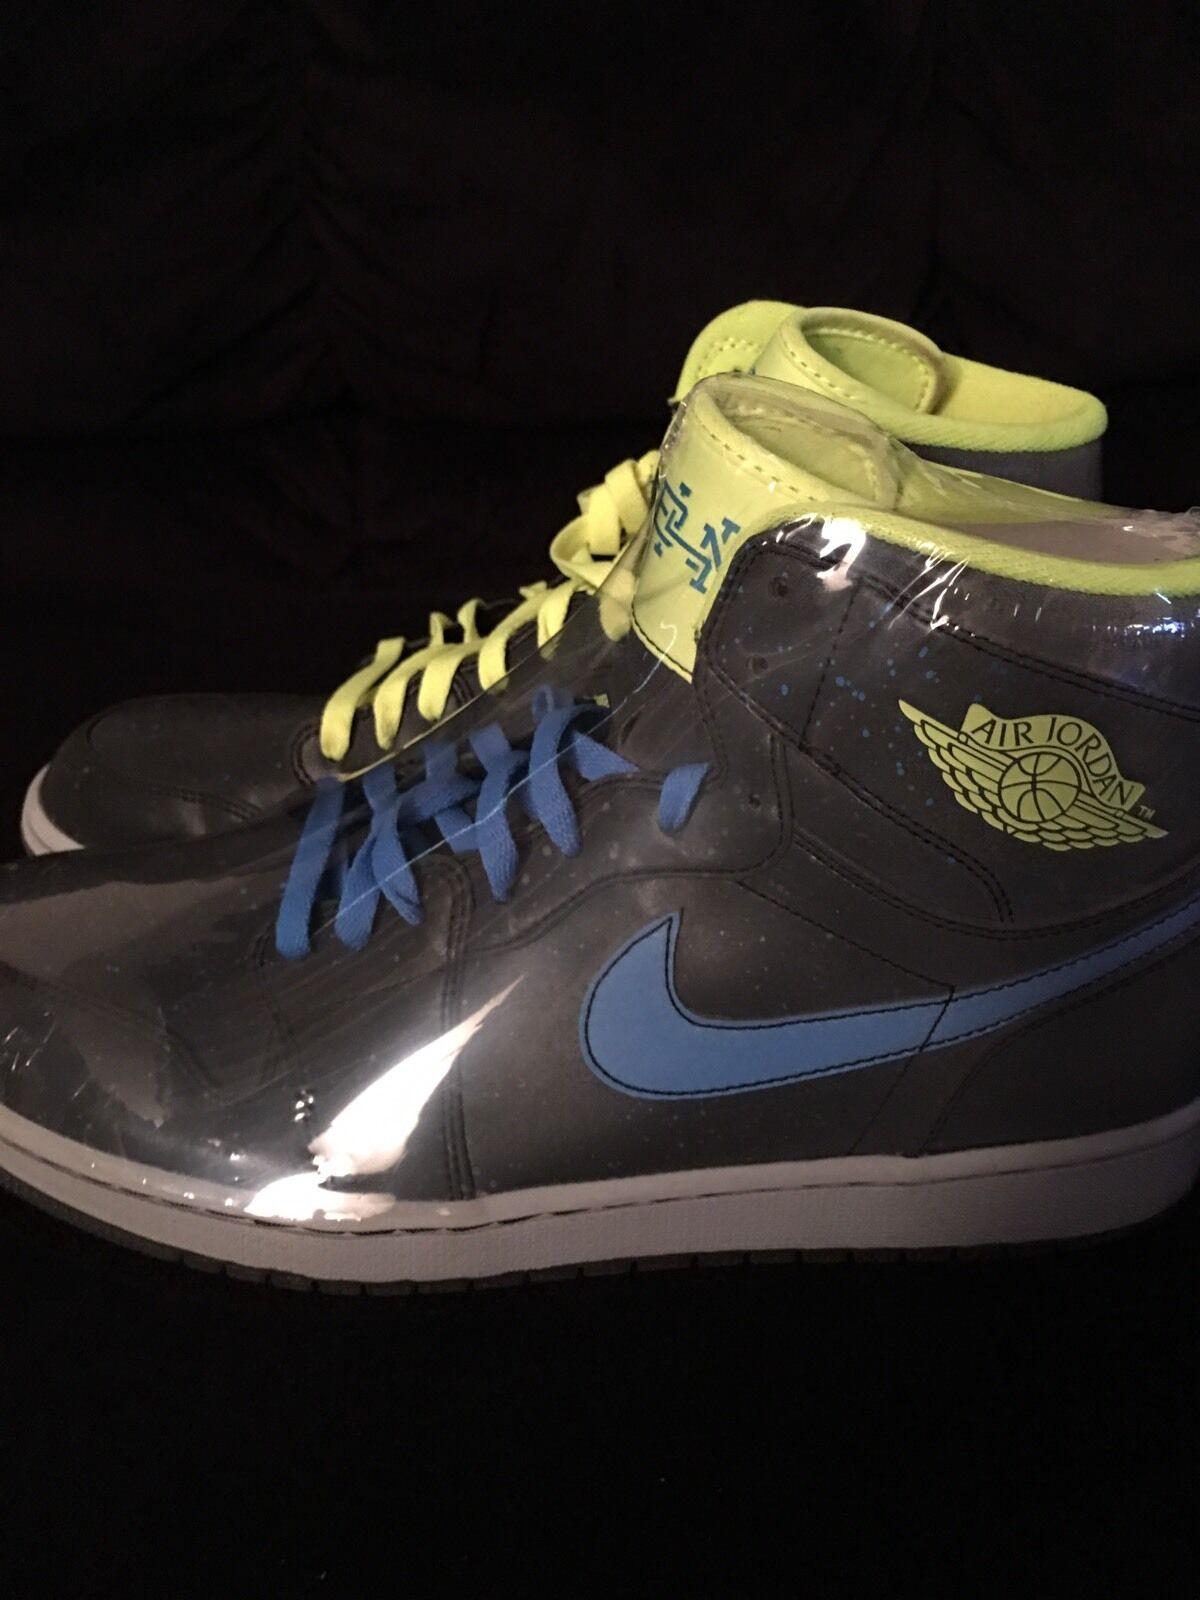 Nike Air Jordan 1 I Retro High BHM Price reduction 579591-012  Comfortable Great discount